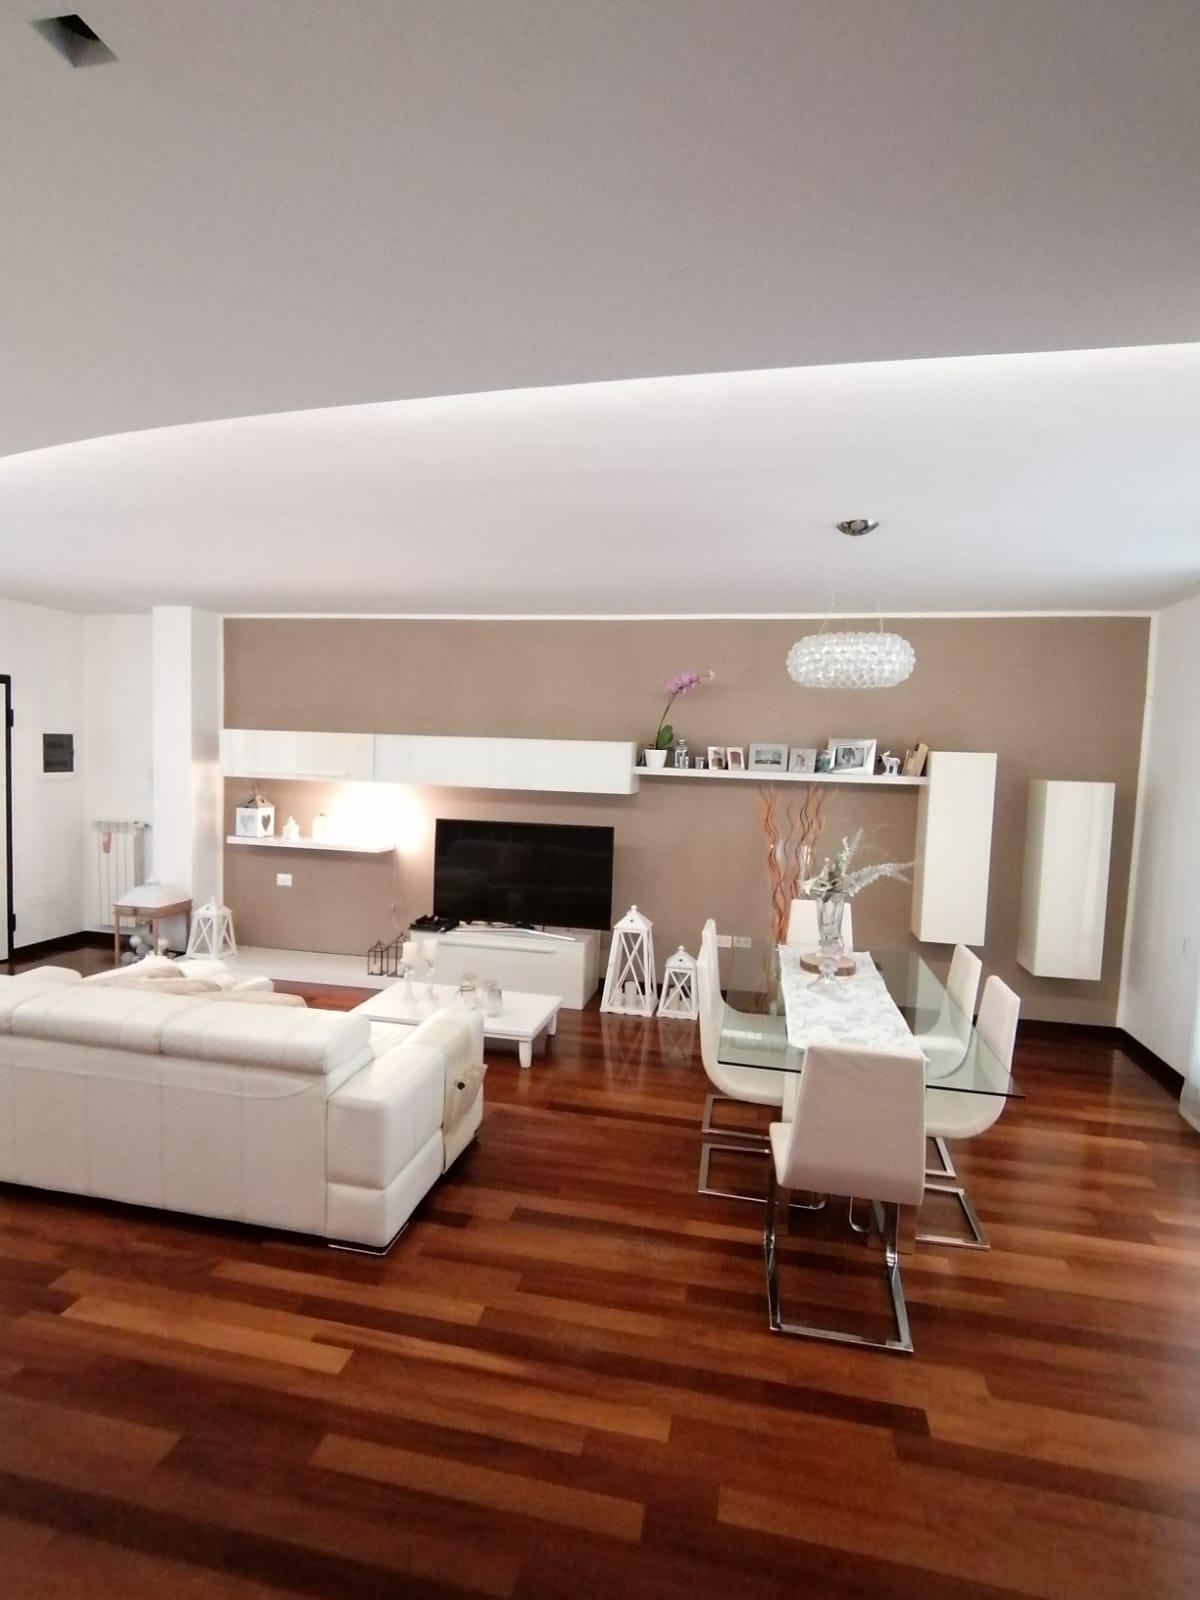 aam 657 Elegant Villa a Schiera/Stylish Side by Side Villa